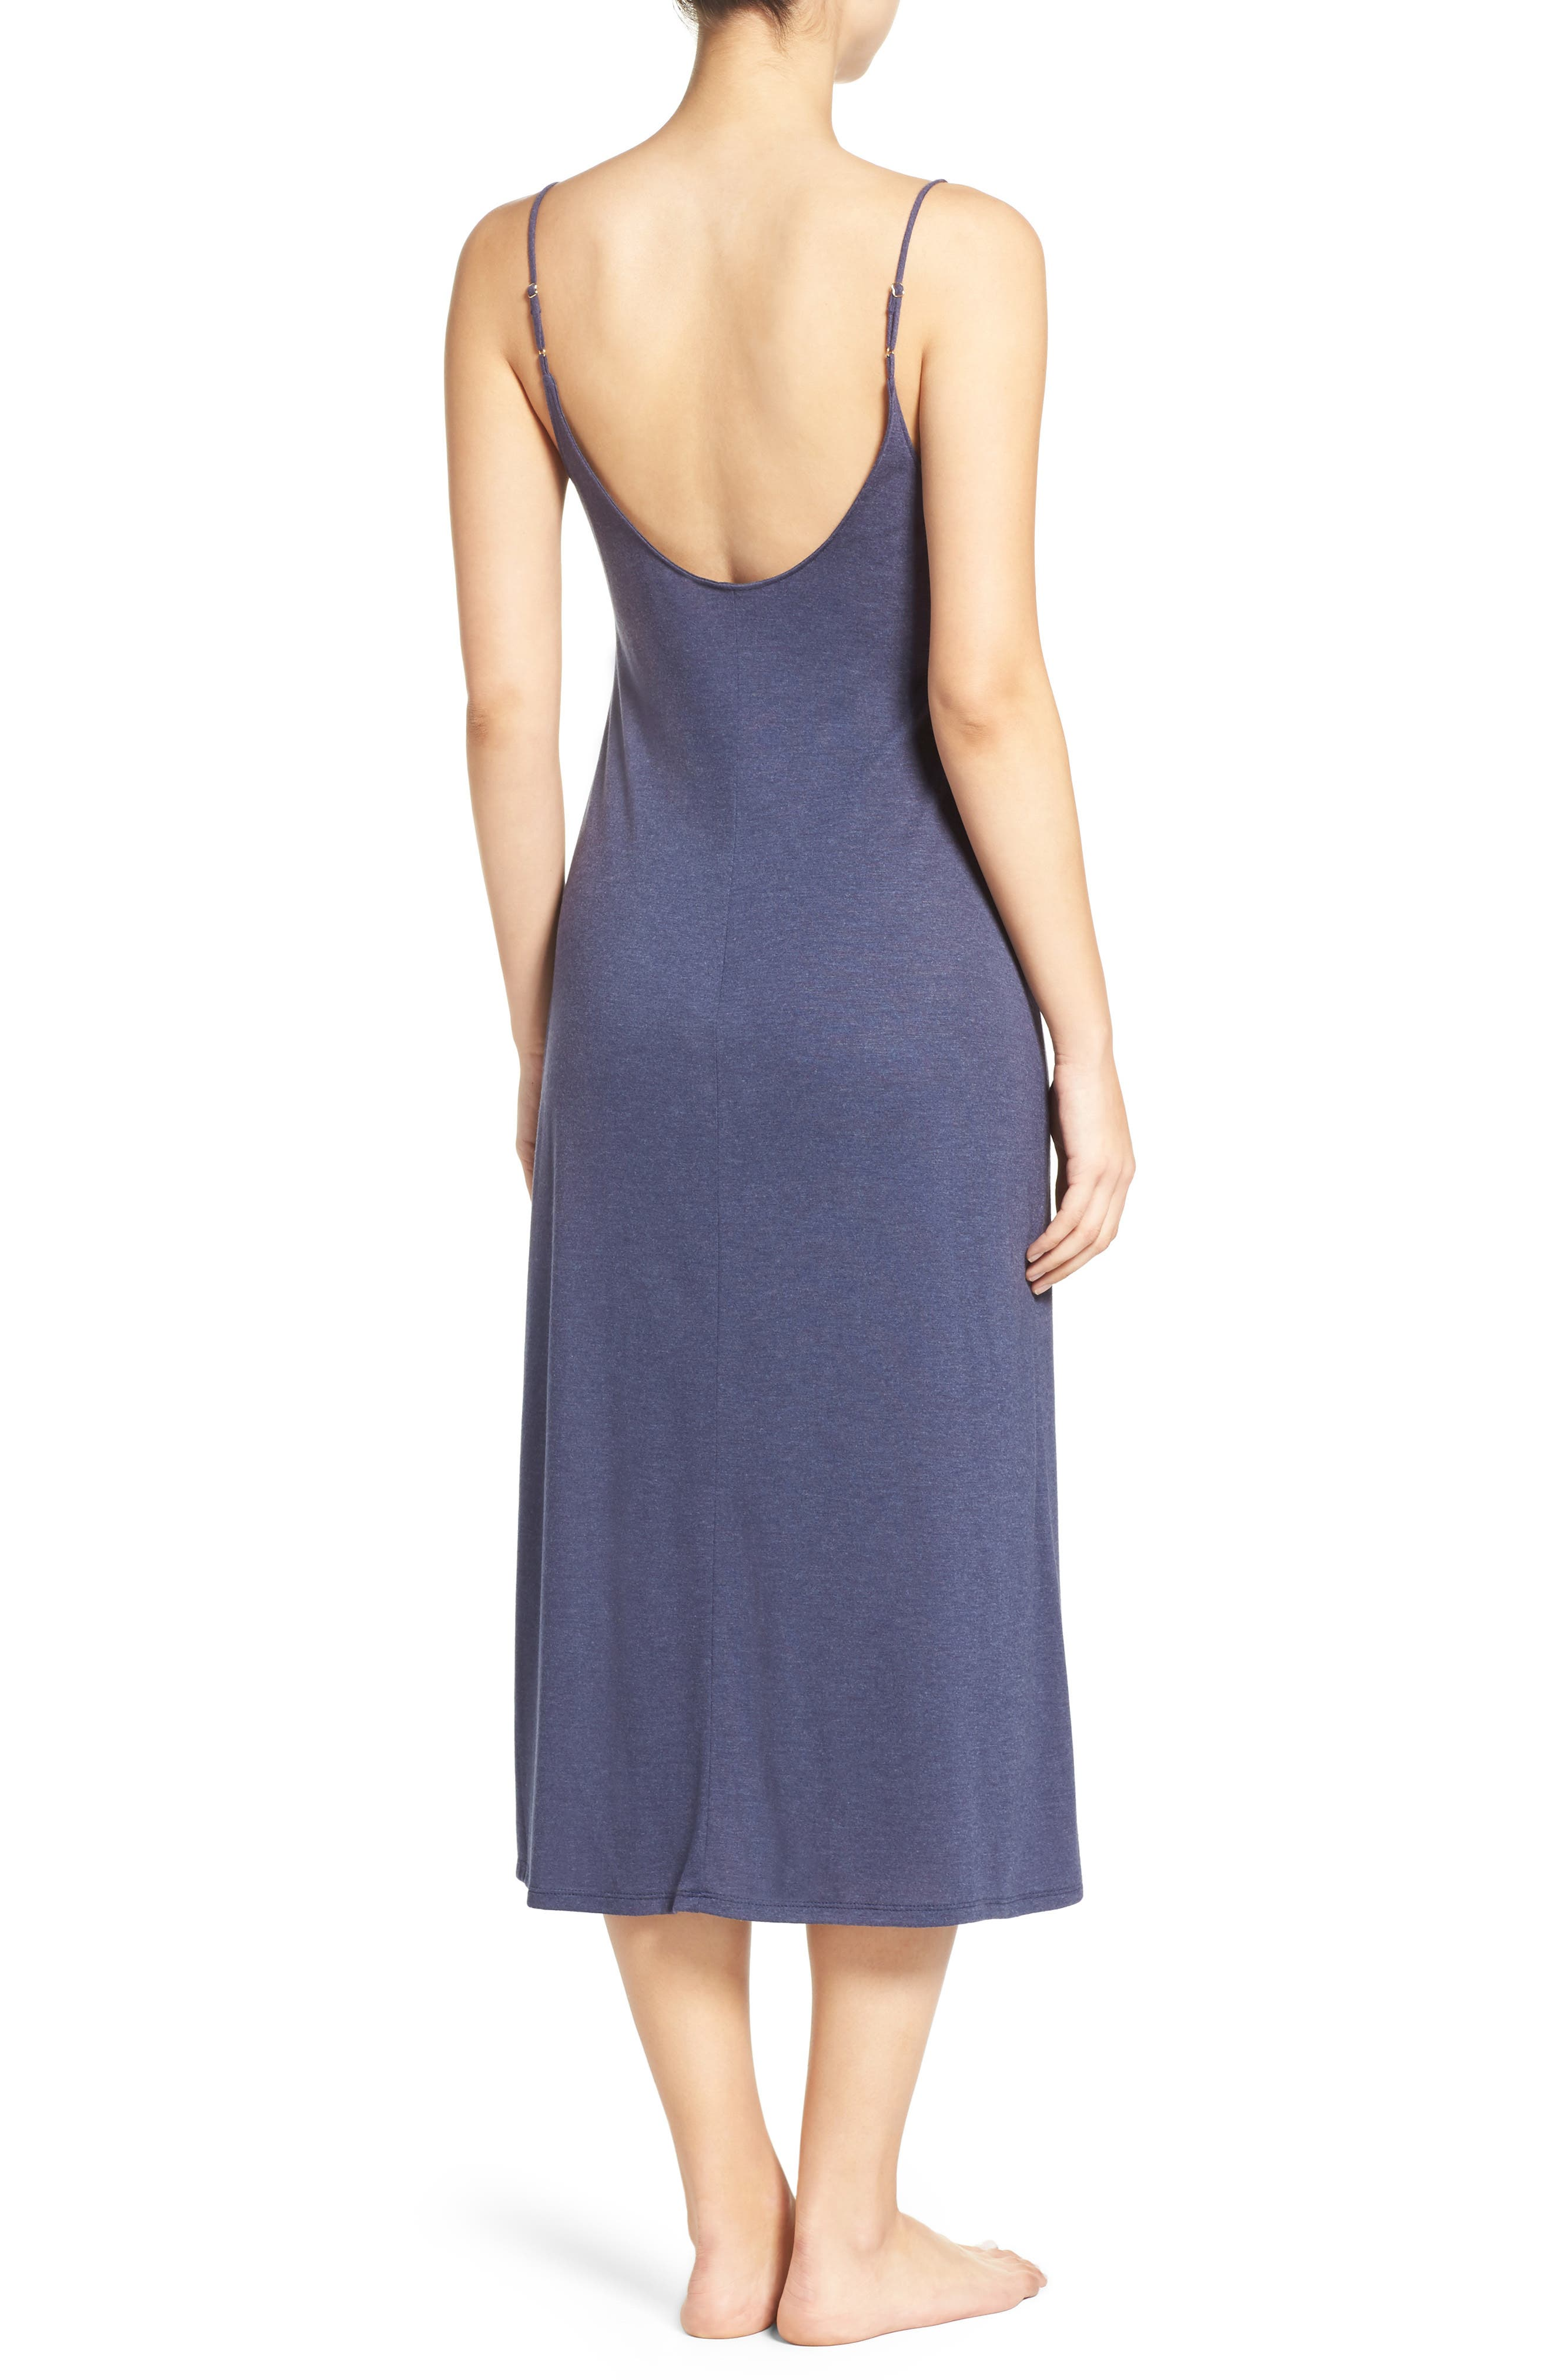 Shangri La Nightgown,                             Alternate thumbnail 2, color,                             HEATHER NIGHT BLUE